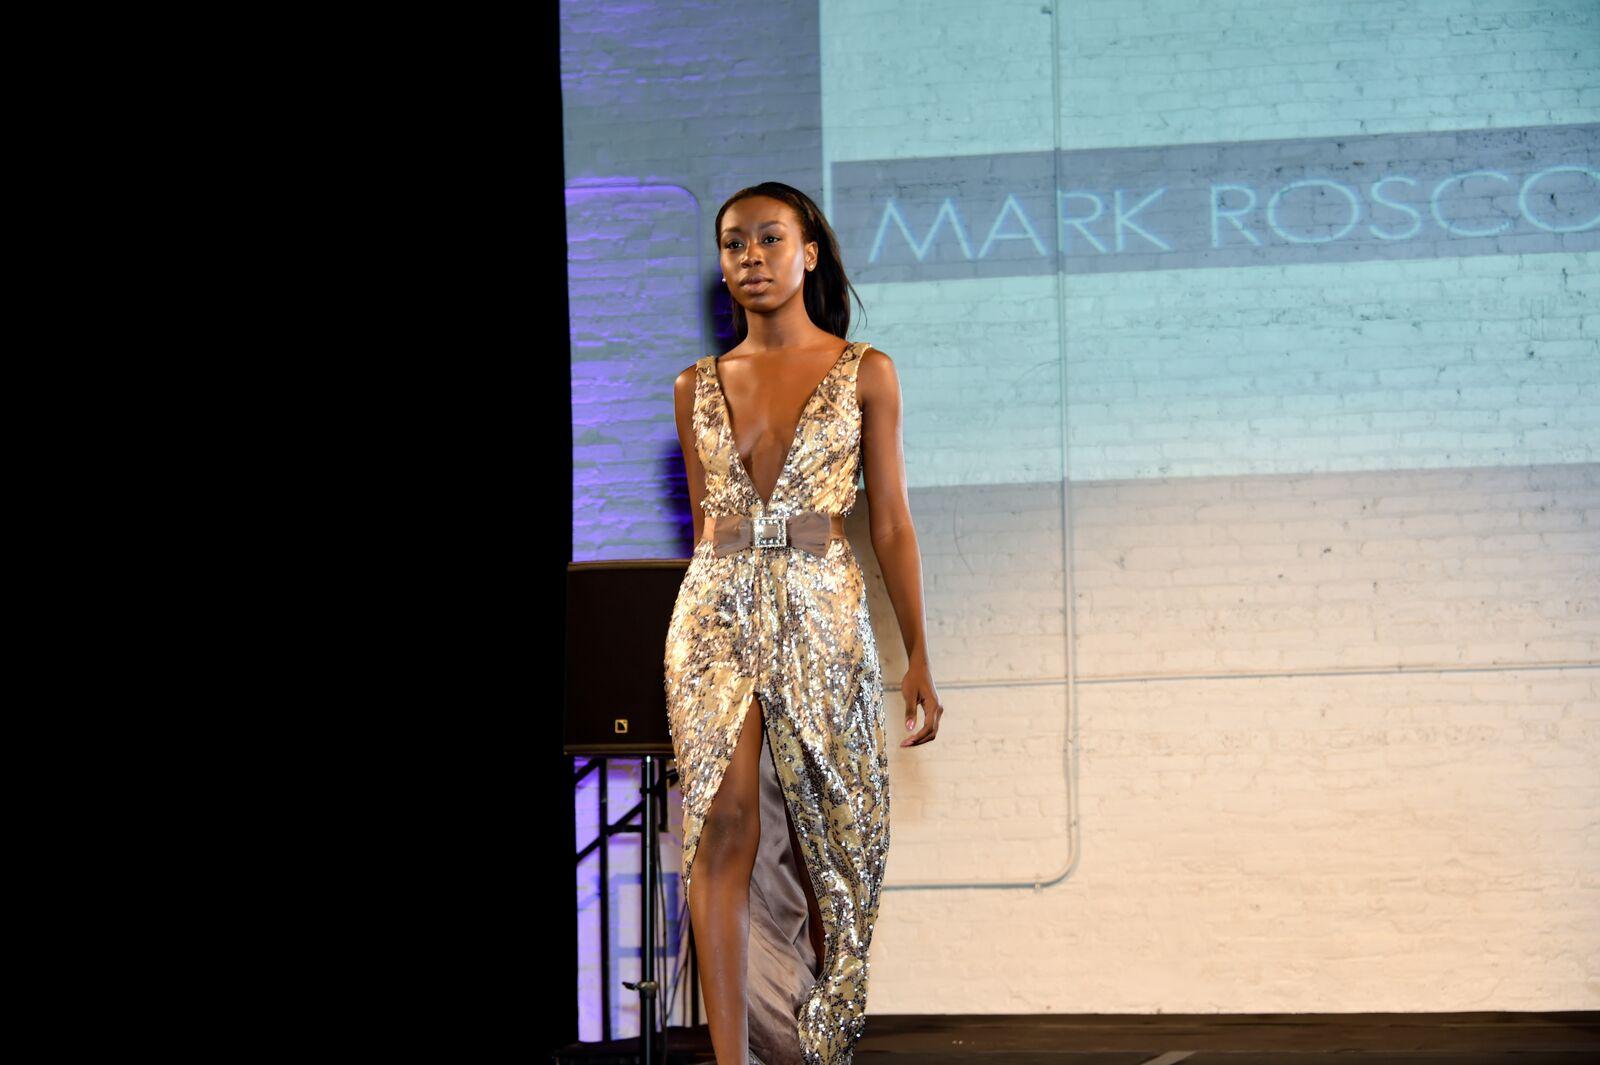 Dress at Chicago Fashion Loves Art Photo: Isabel Souza